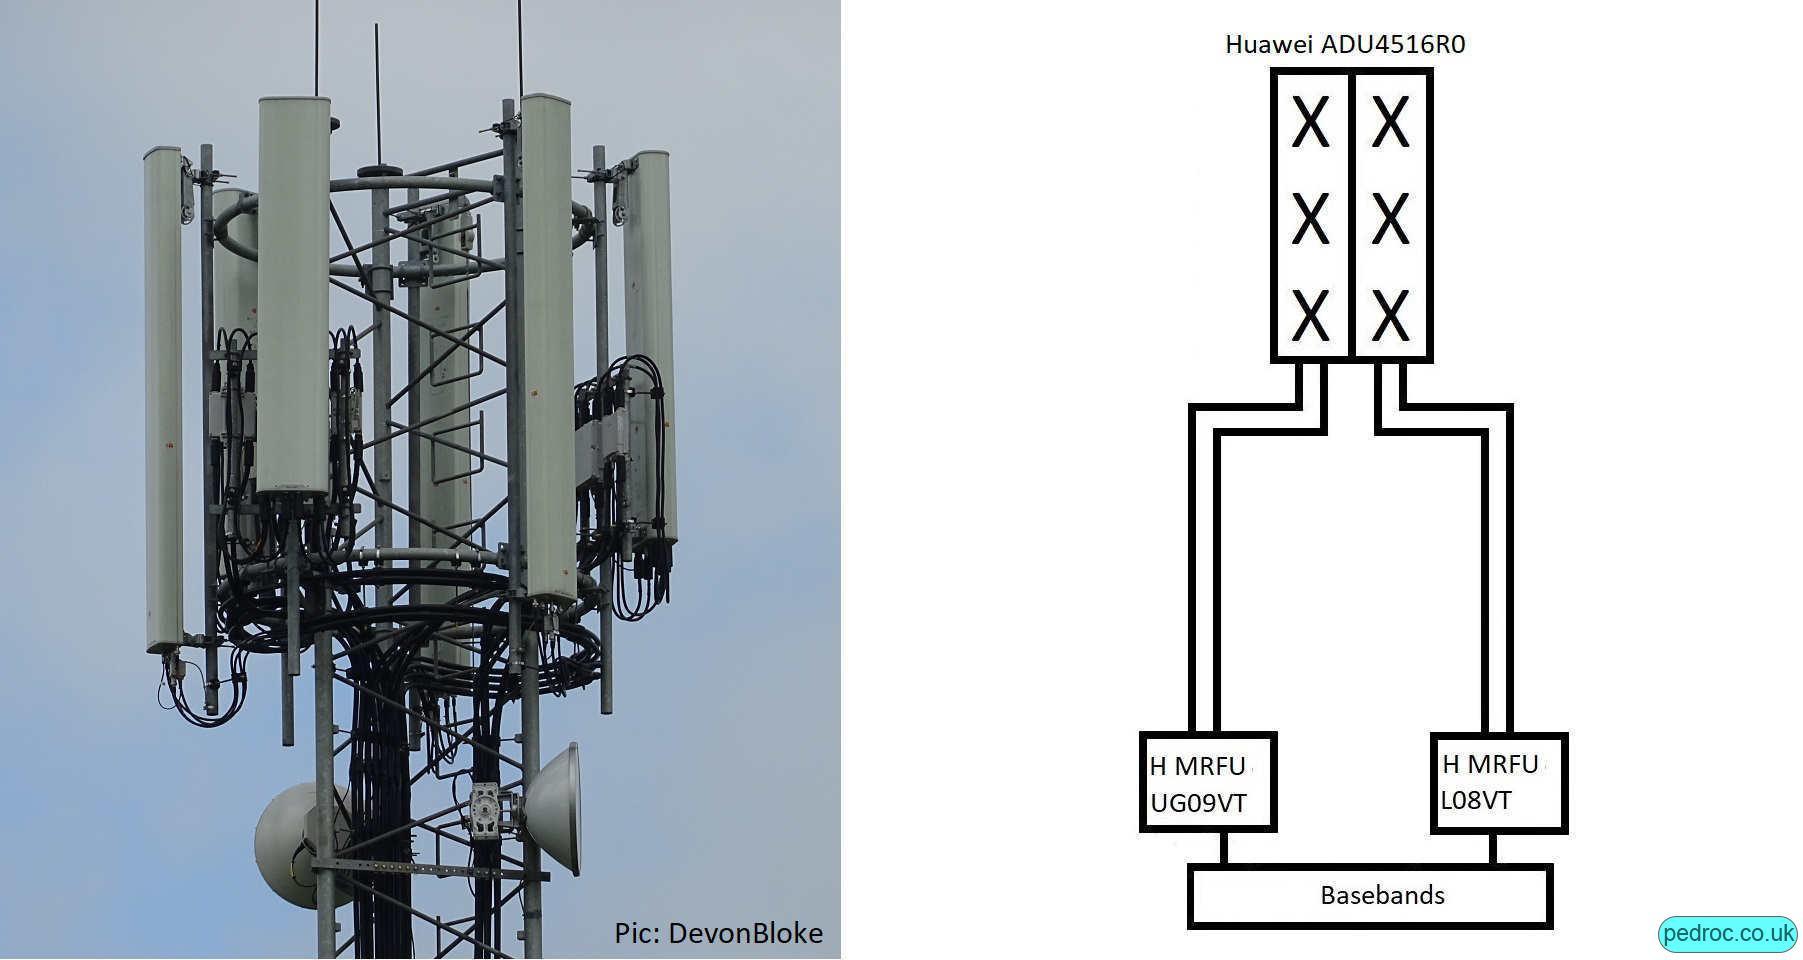 Vodafone Huawei low band site with Huawei ADU4516R0 dual low antennas.